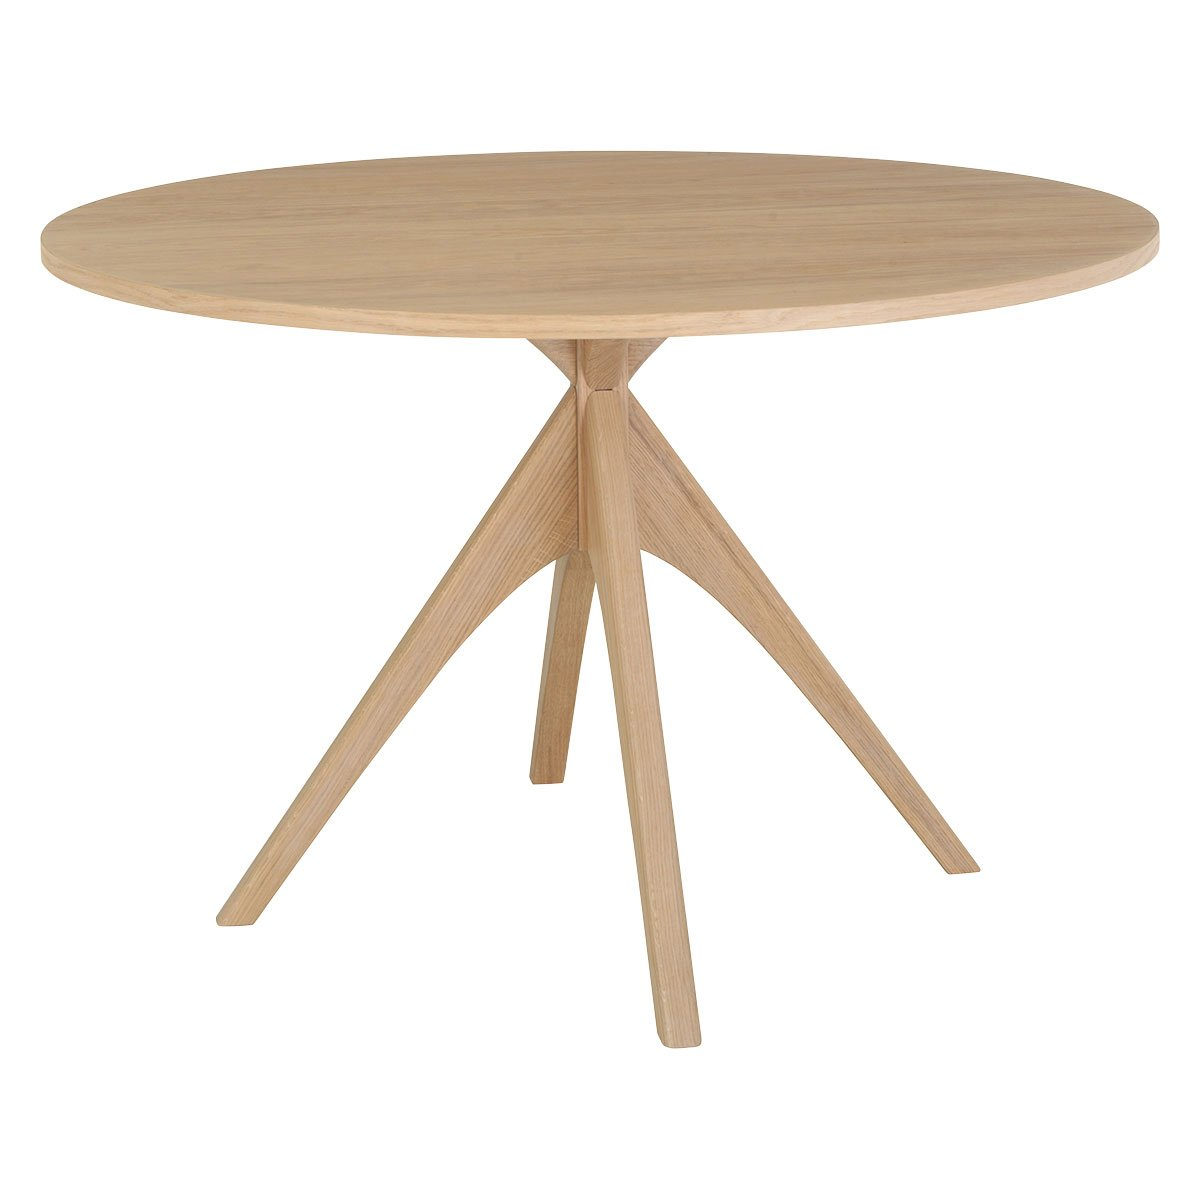 Habitat Austin Oak Round 4 Seater Dining Table